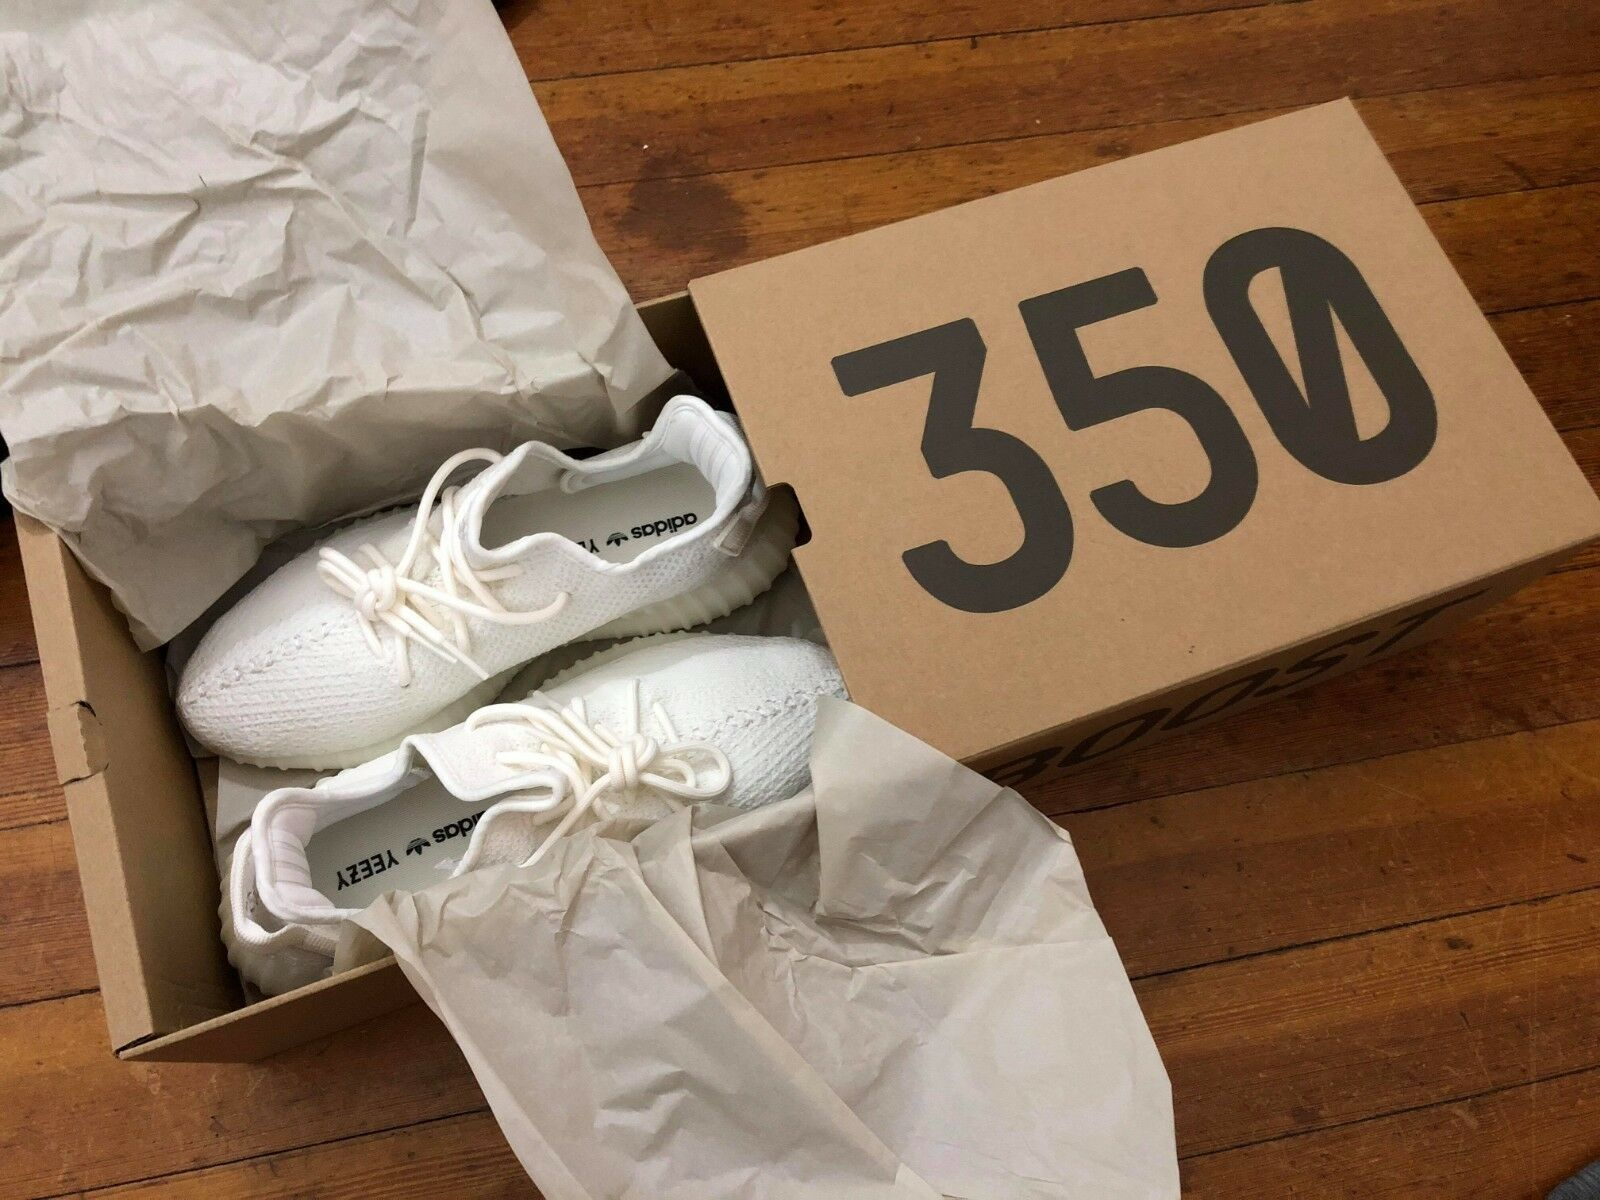 Adidas yeezy auftrieb 350 v2 triple triple triple weiße creme cp9366 größe 10. 6ff99a